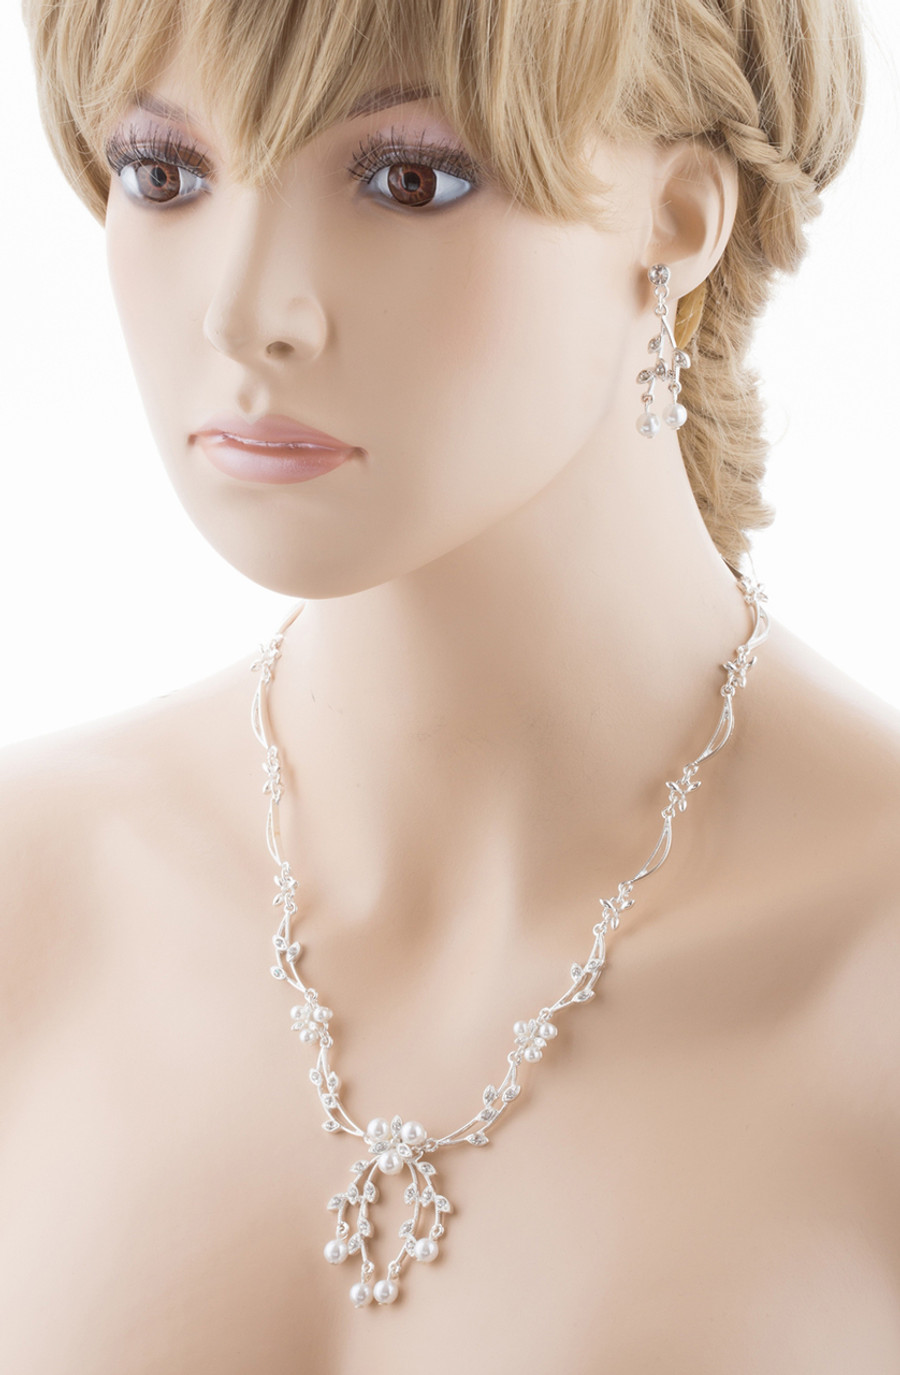 Bridal Wedding Jewelry Set Crystal Rhinestone Floral Pearl Necklace Silver